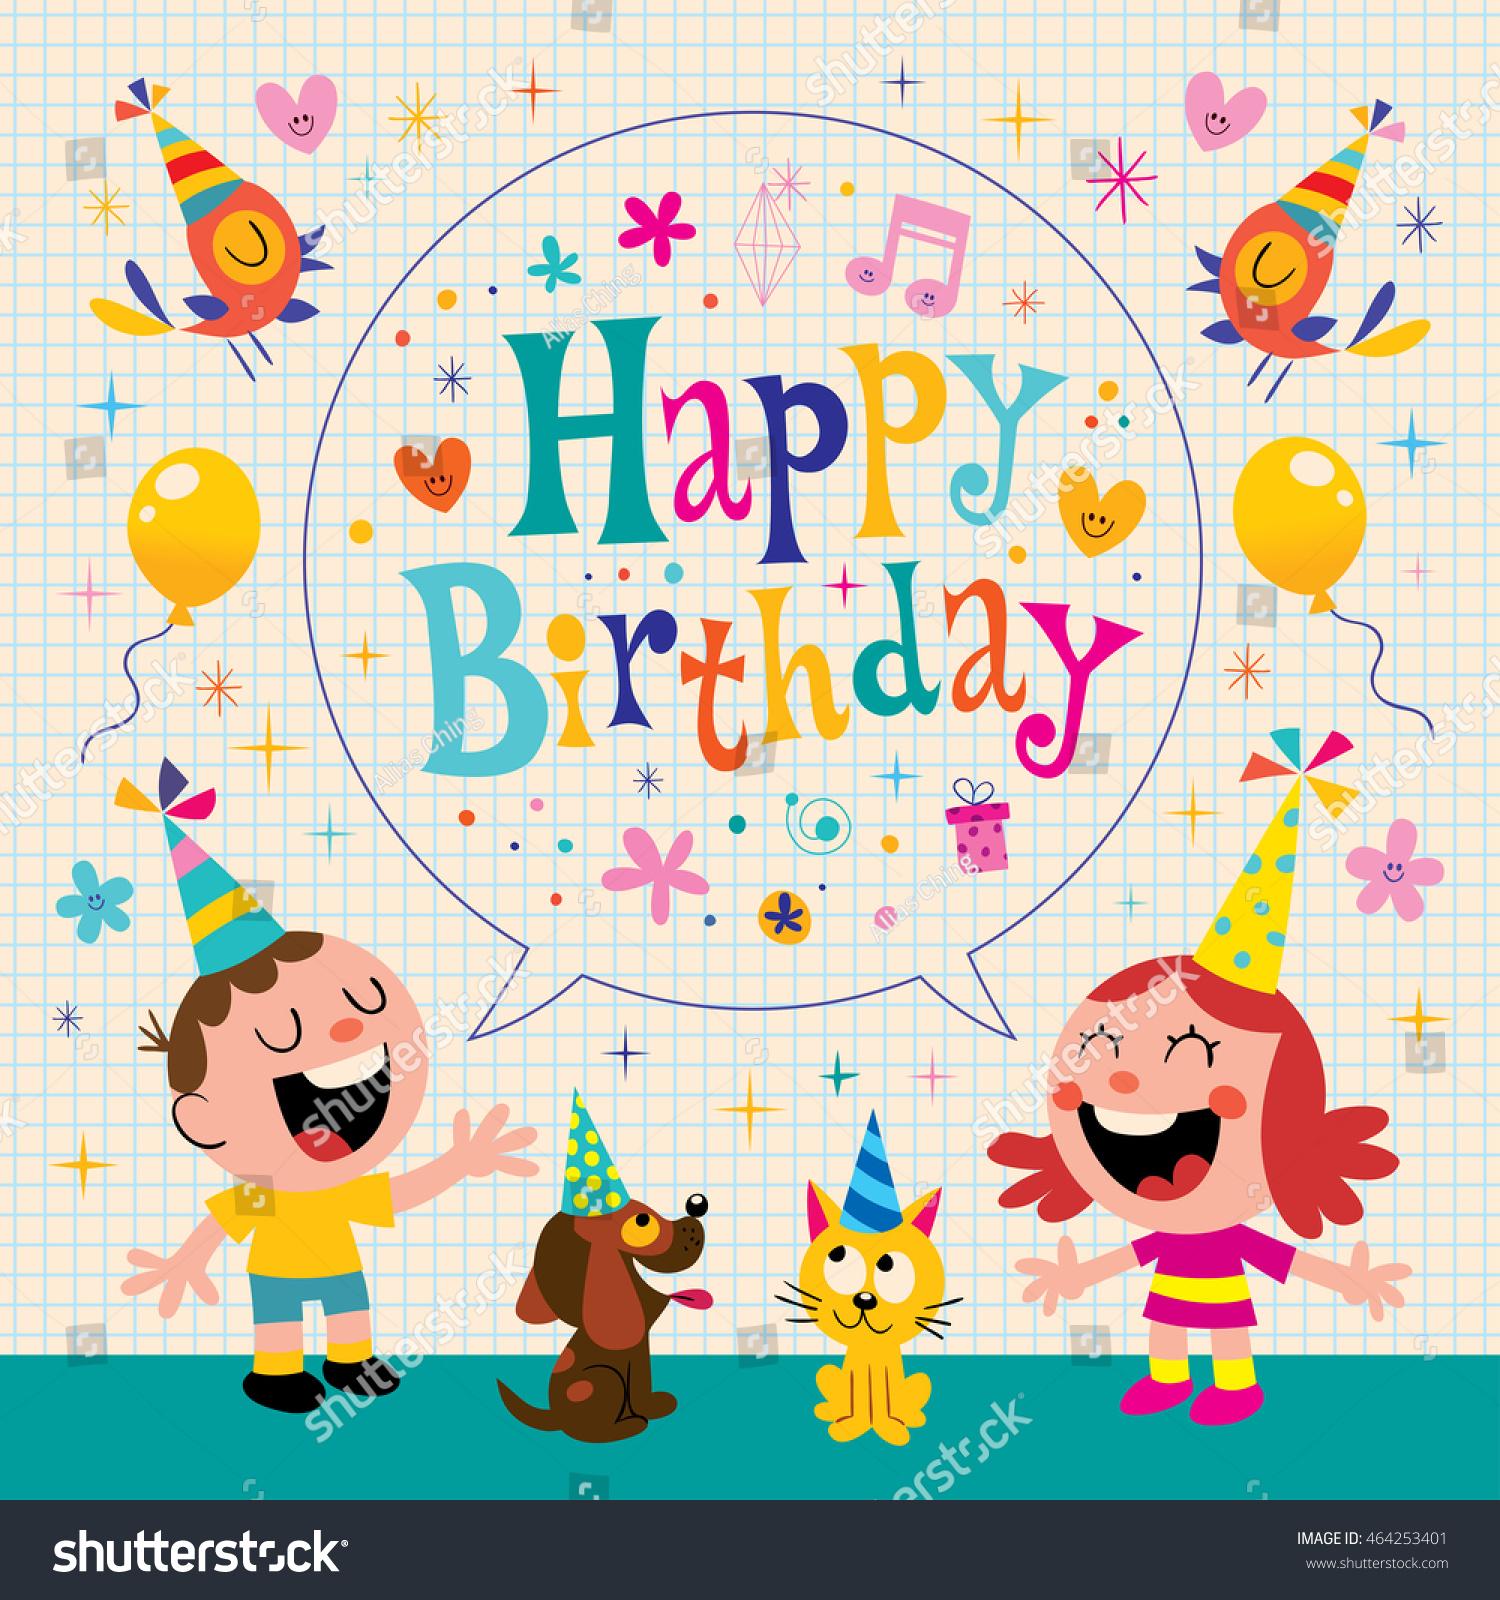 Happy Birthday Kids Greeting Card Design Stock Vector